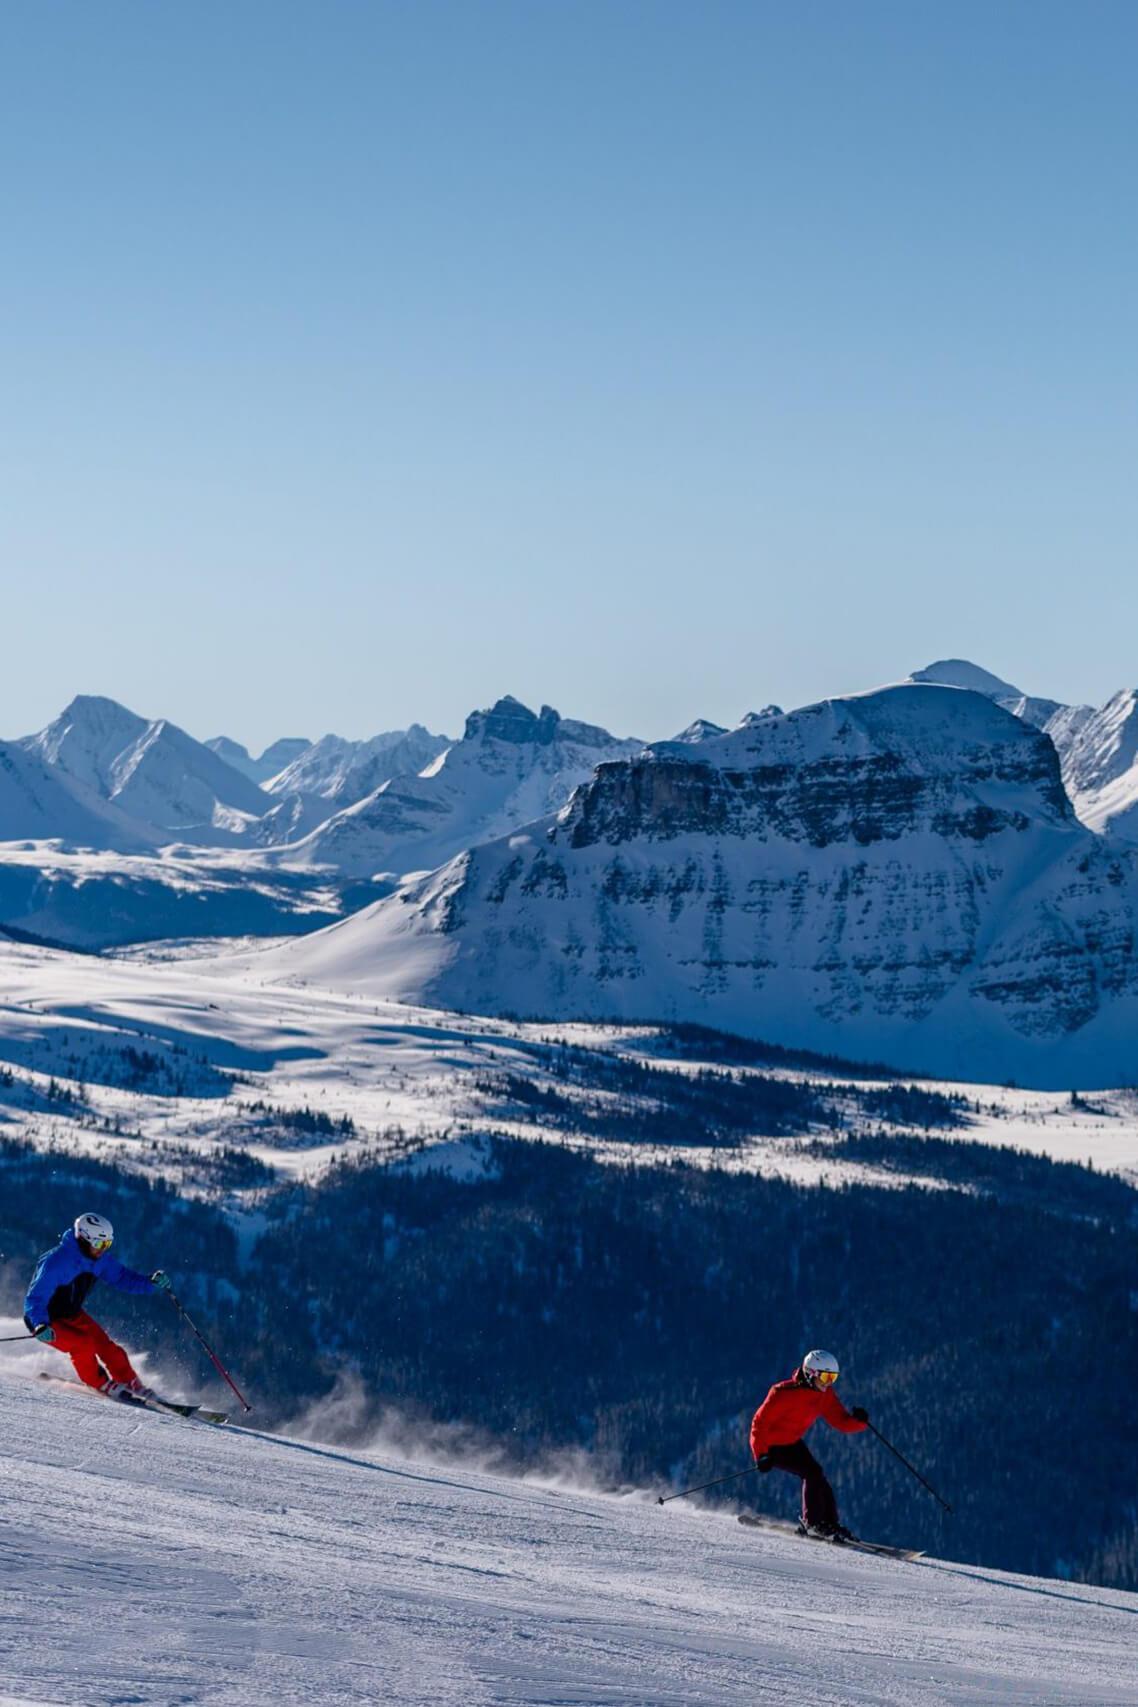 Banff Sunshine-skiing